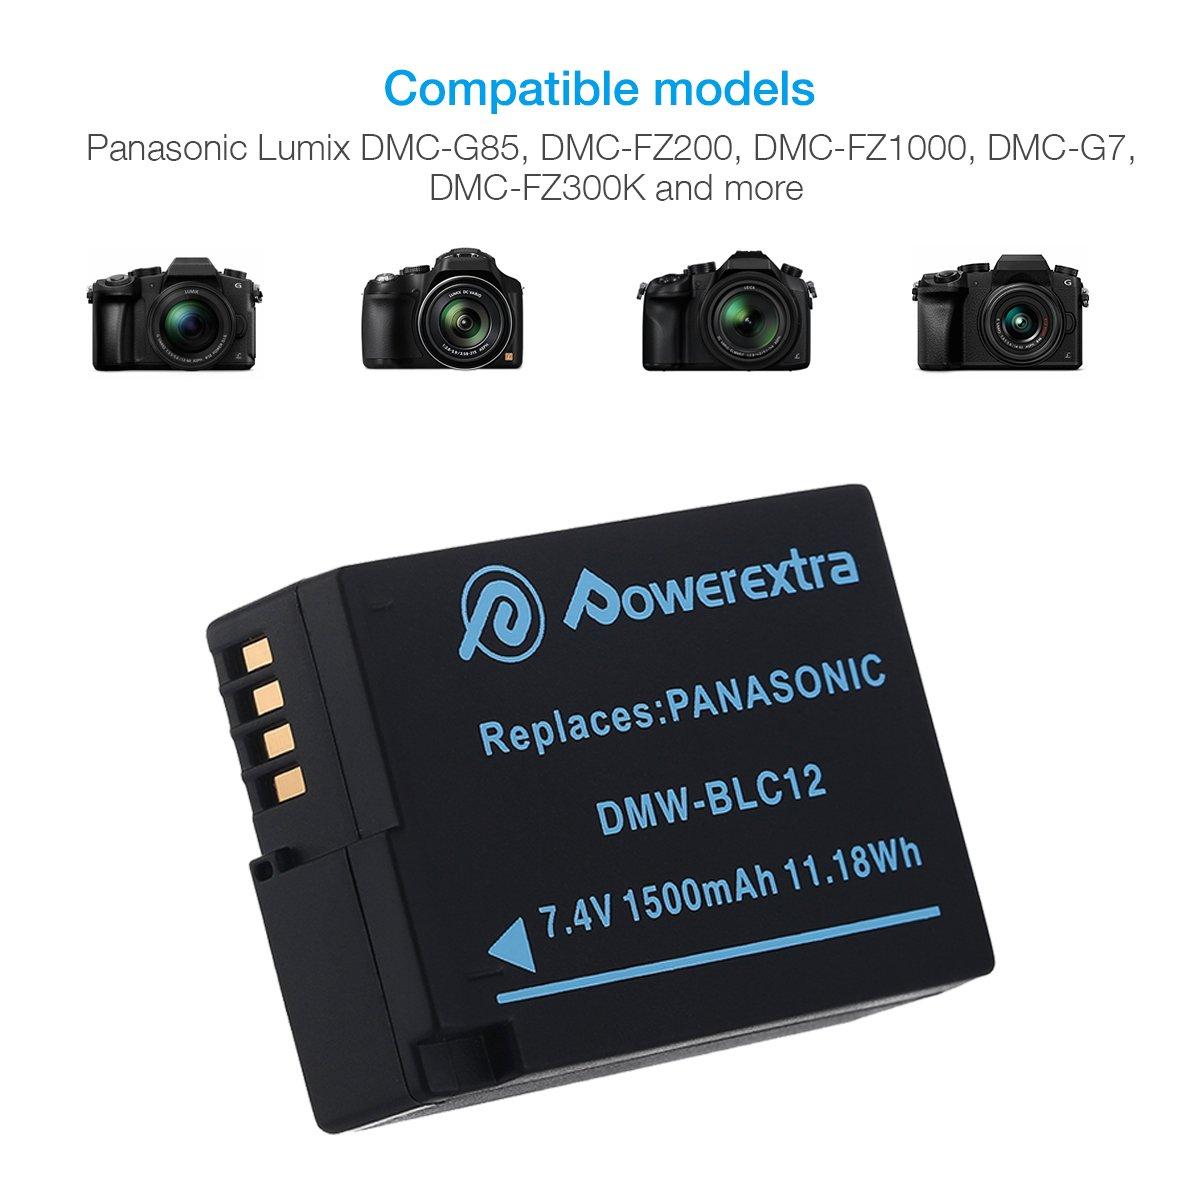 DMC-G5 DMC-GH2 Powerextra 2 Pack Replacement Panasonic DMW-BLC12 Battery and Smart Dual USB Charger with LCD Display for Panasonic Lumix DMC-FZ200 DMC-G6 DMC-FZ1000 DMC-G7 DMC-G85 DMC-GX8